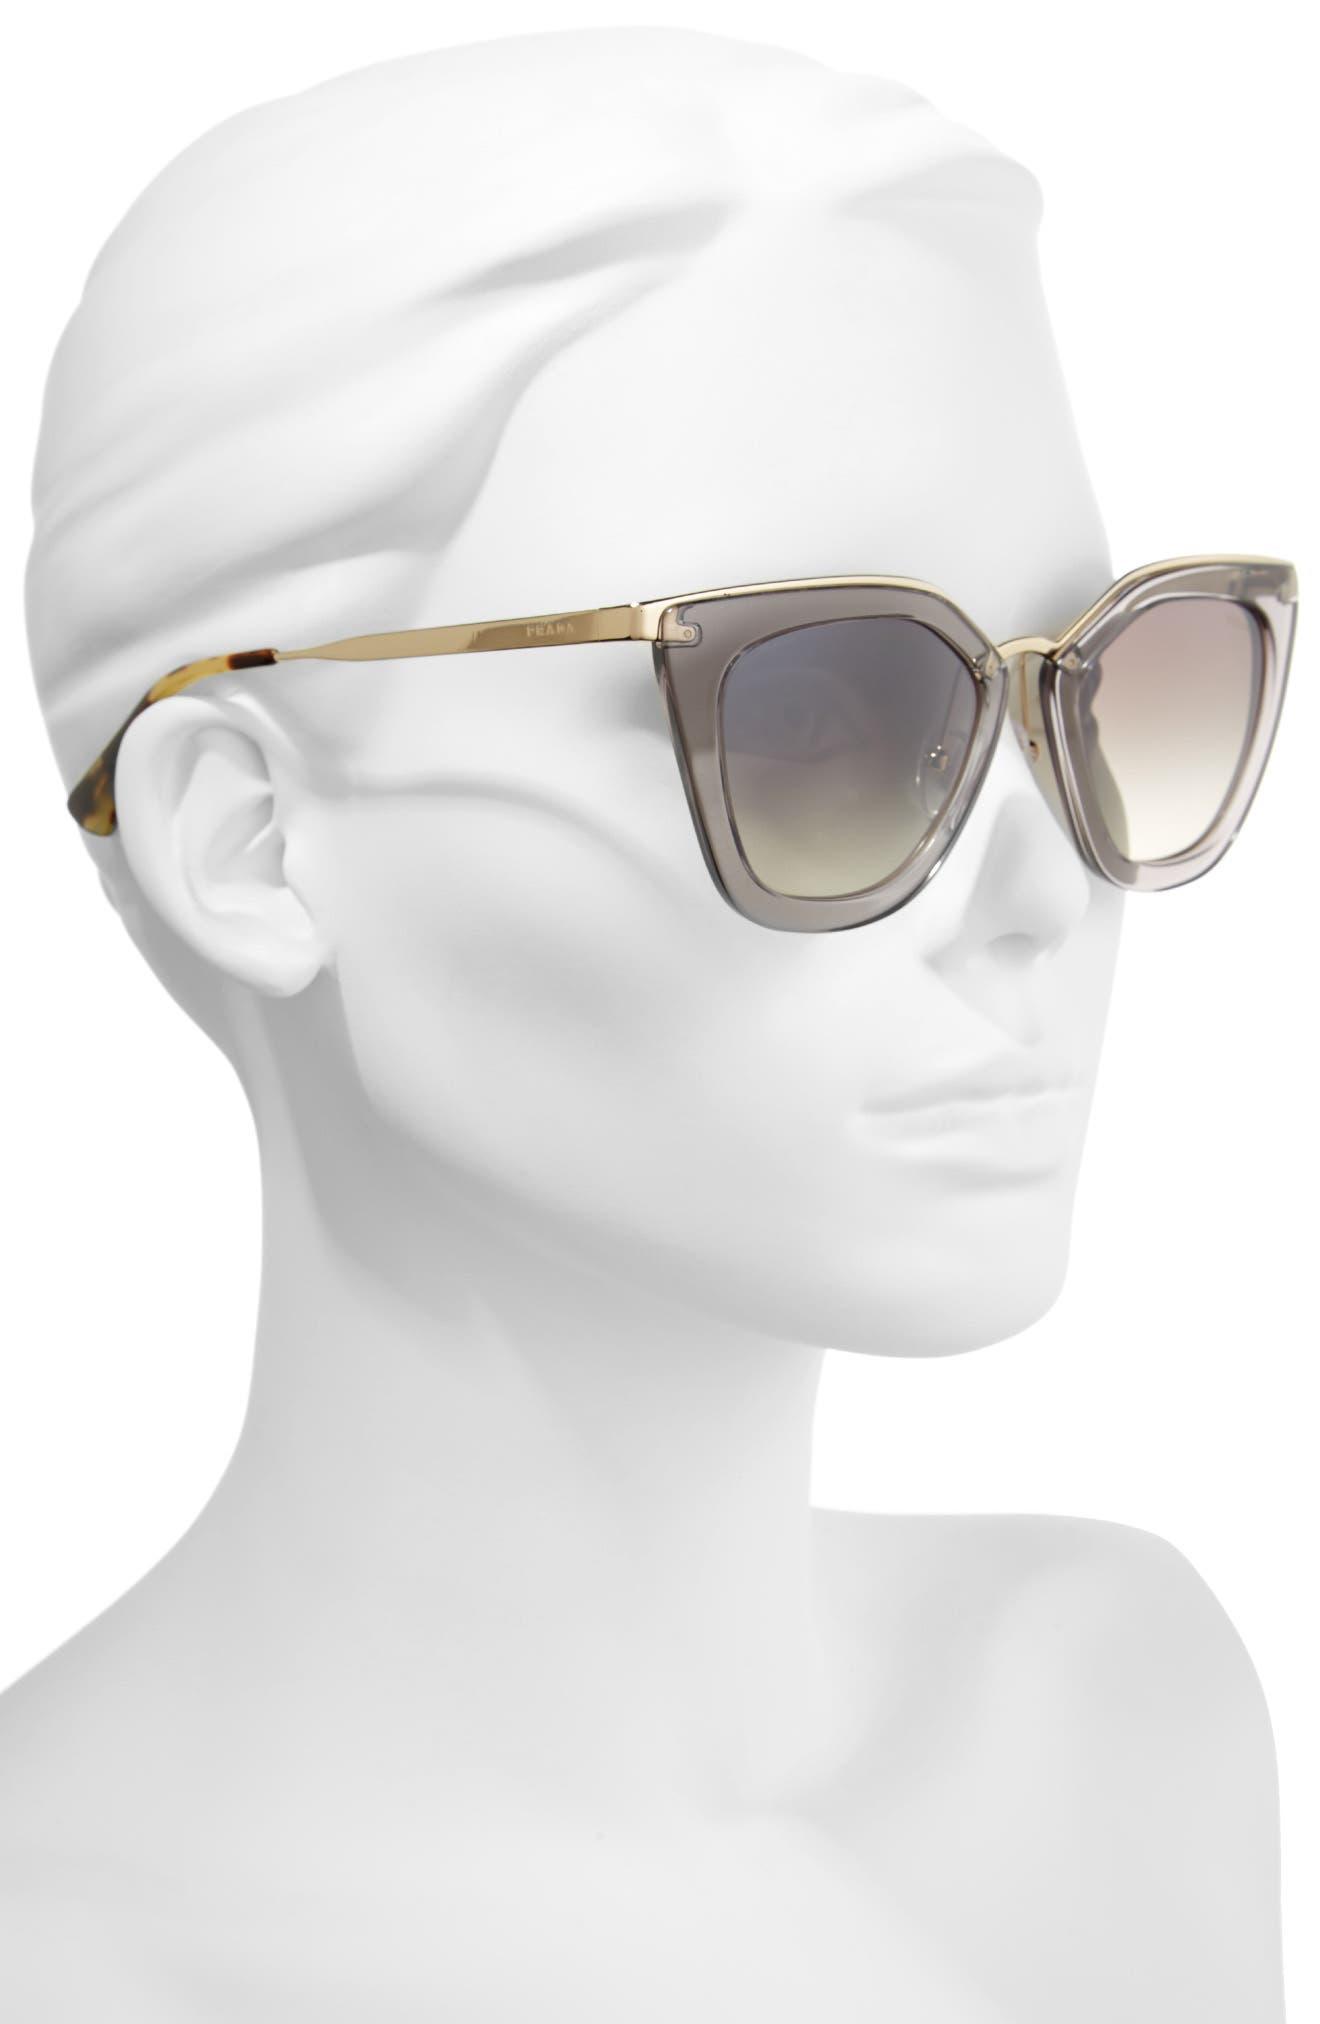 52mm Gradient Cat Eye Sunglasses,                             Alternate thumbnail 2, color,                             Transparent Grey